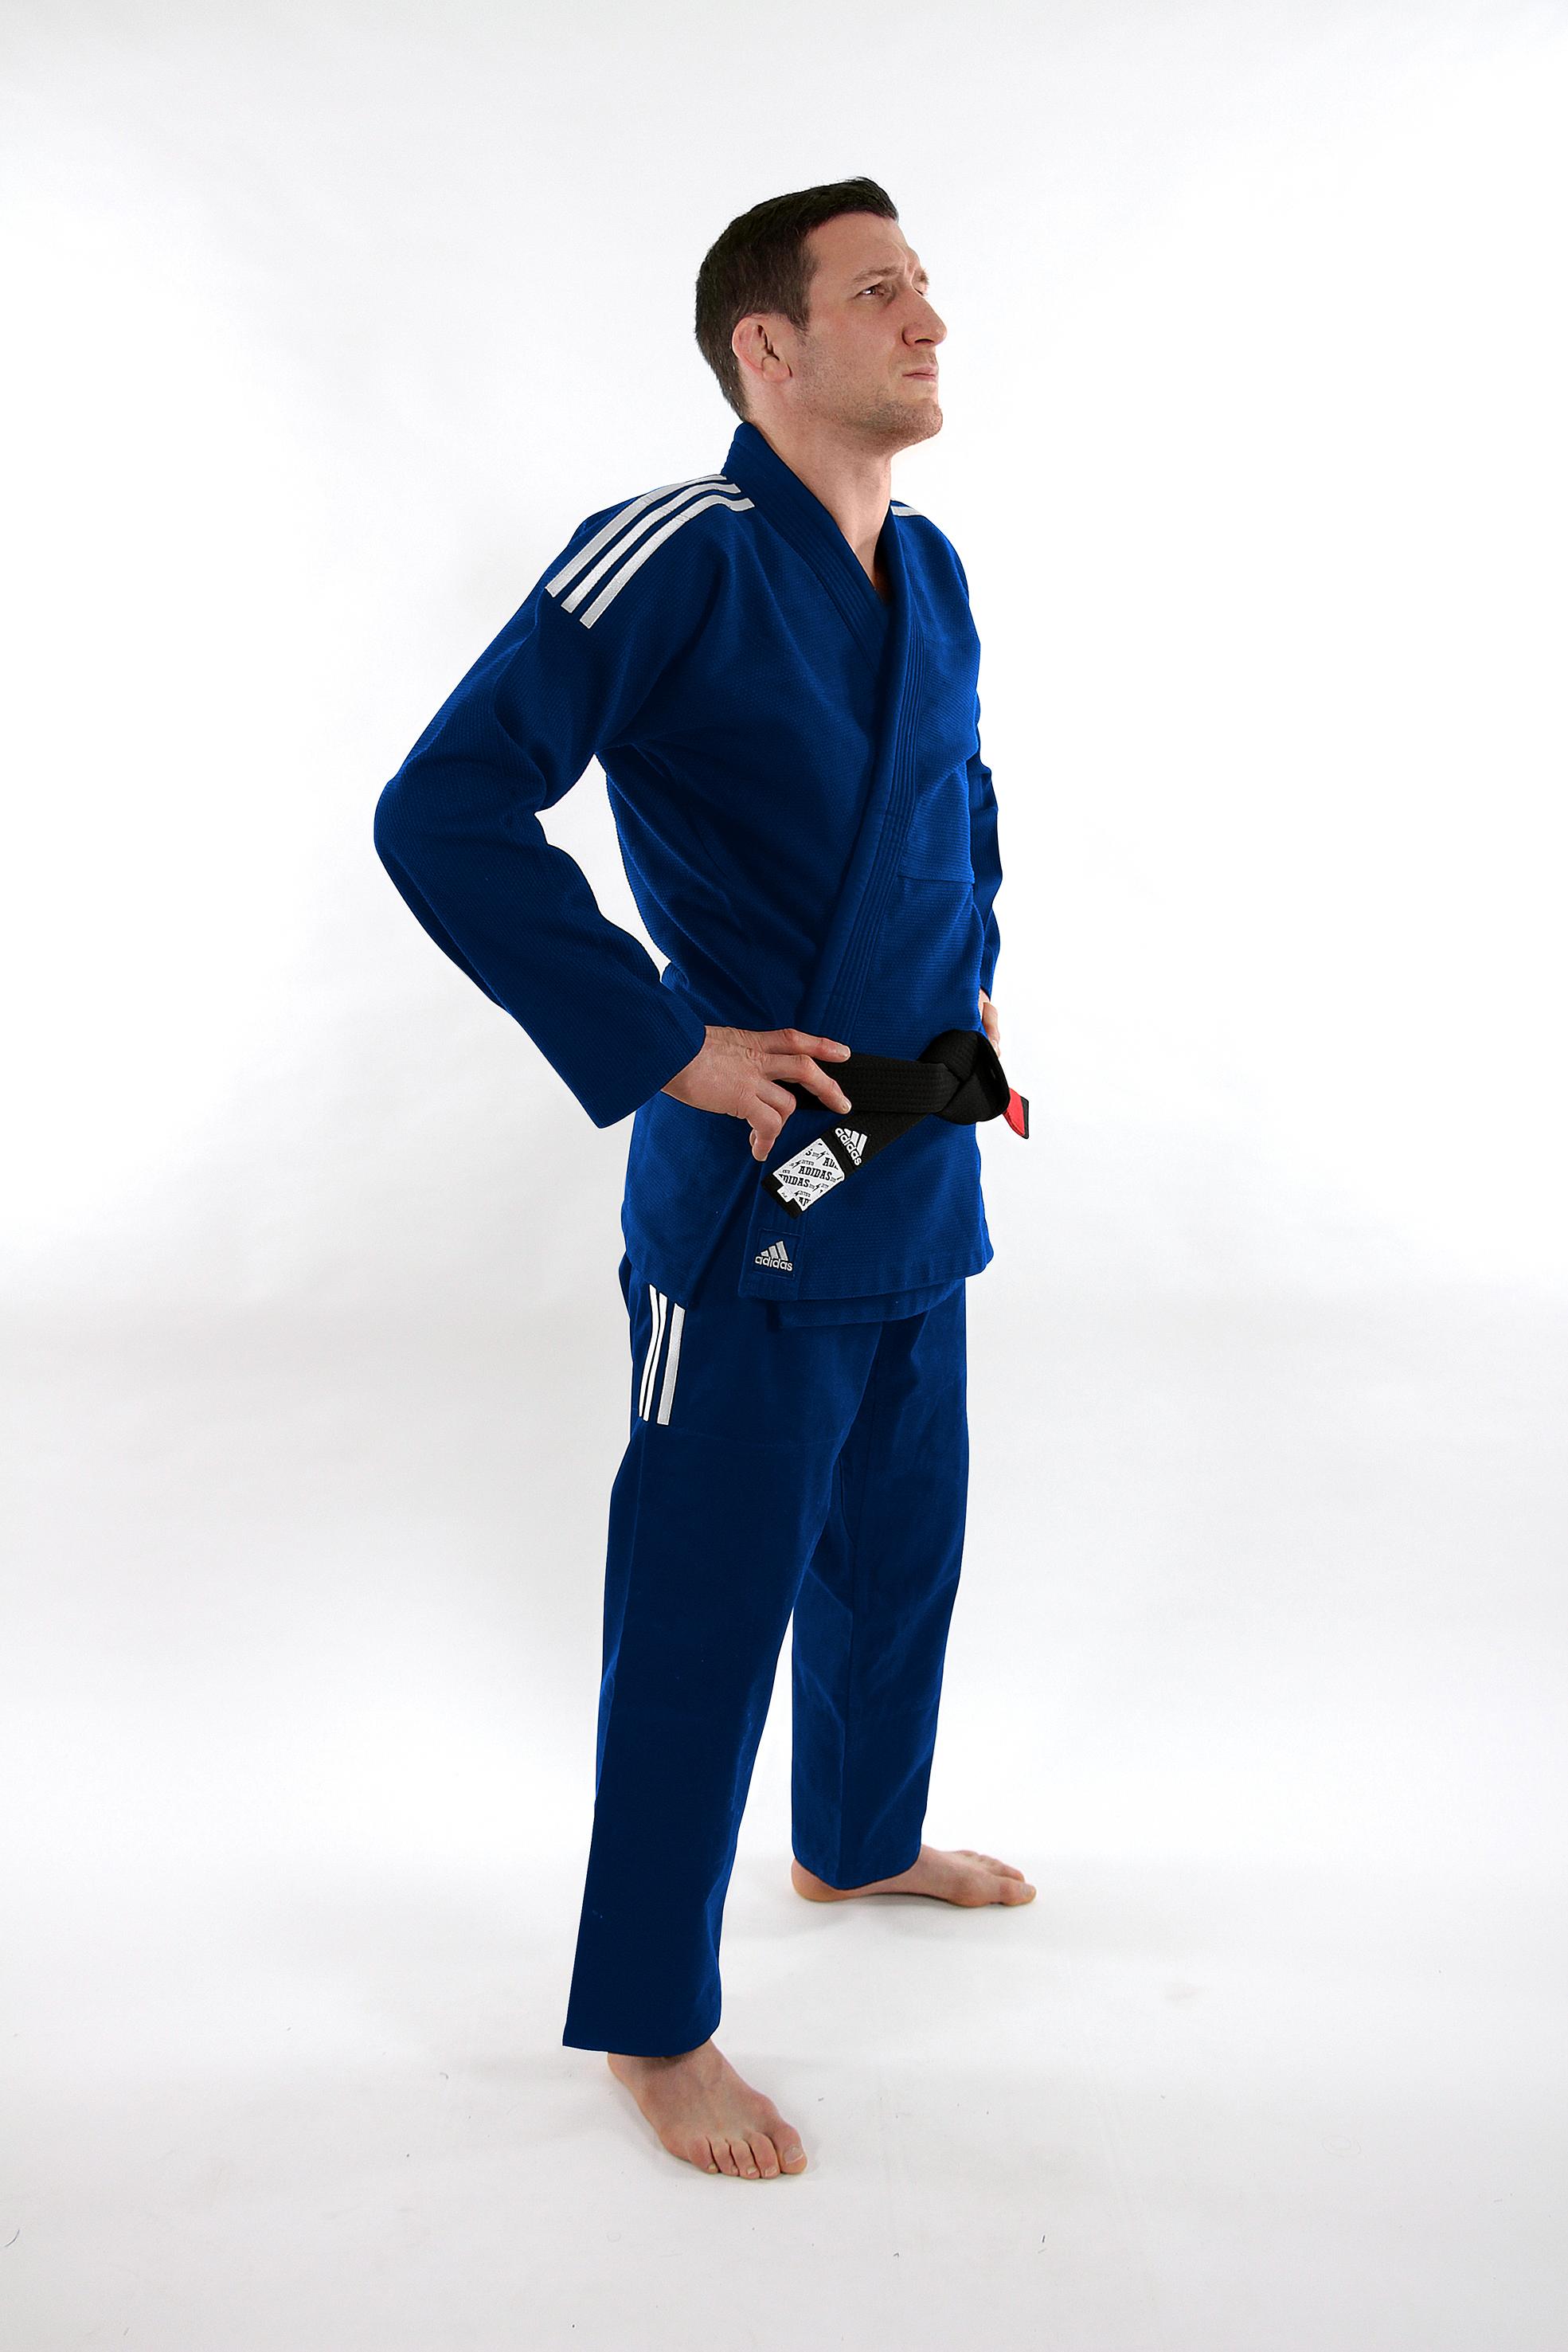 Image of   Adidas Contest Brazilian Jiujitsu Suit - Blå